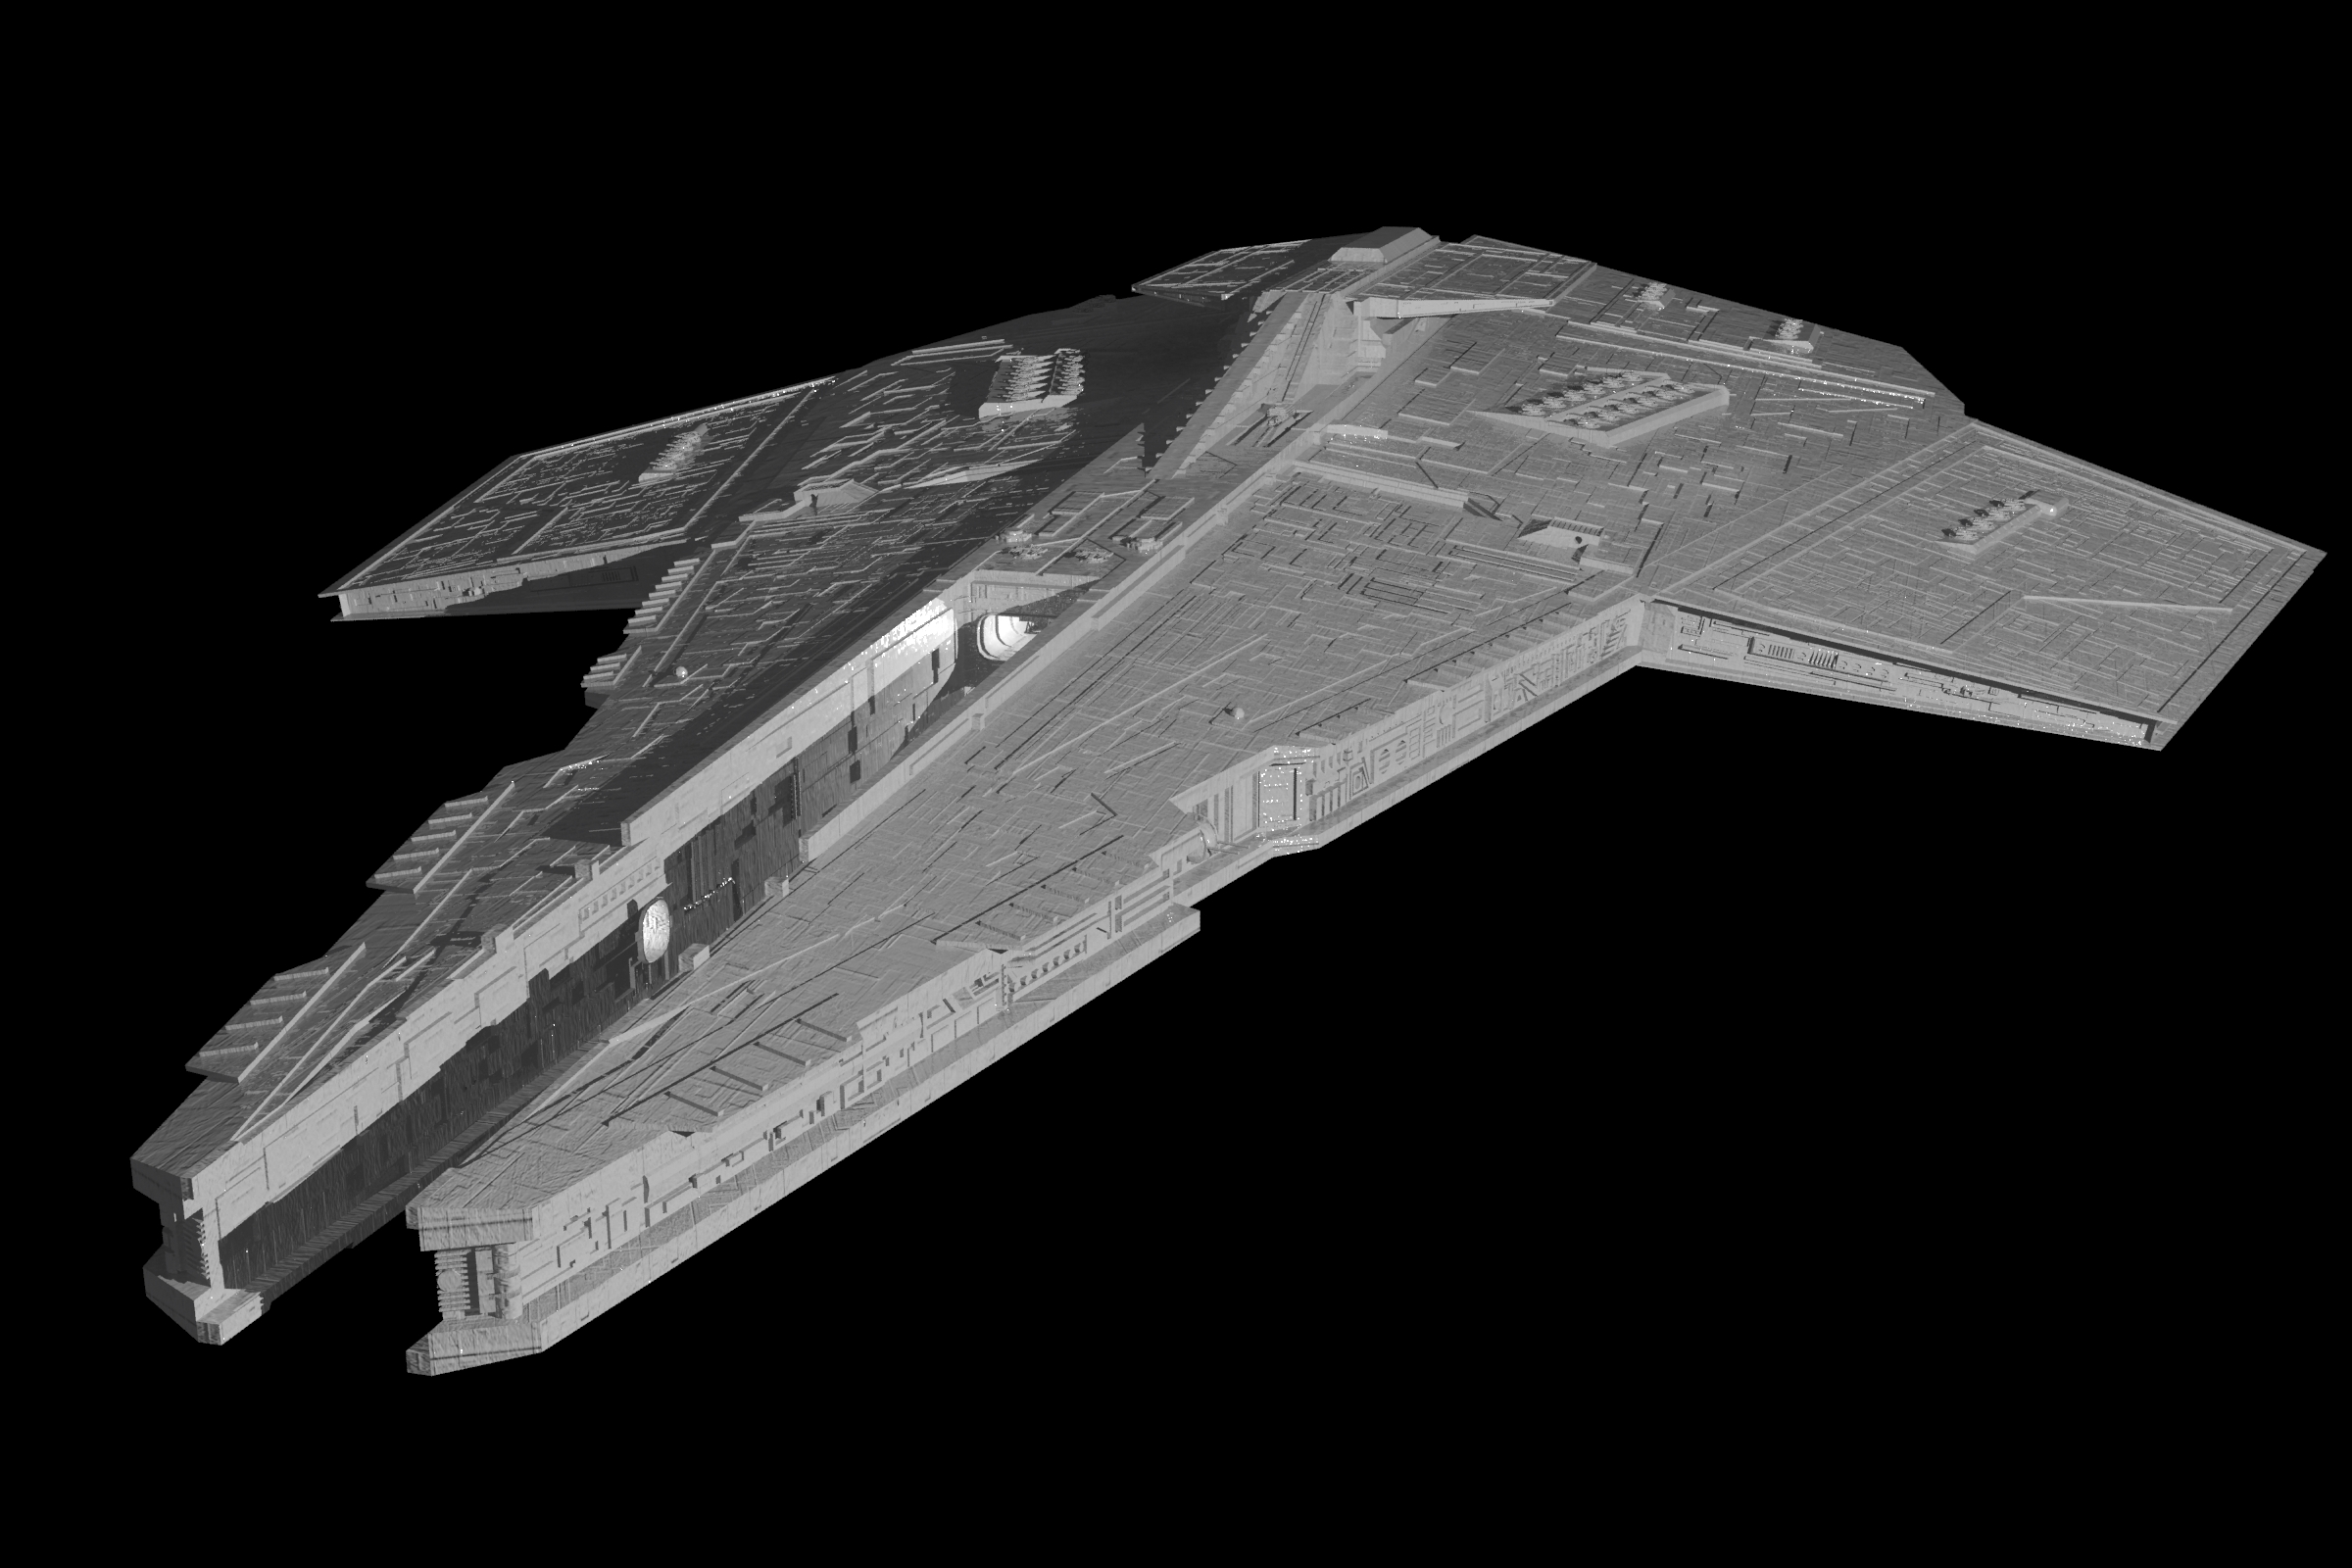 deviant_class_star_destroyer_by_exoticctofu-d632uk9.jpg